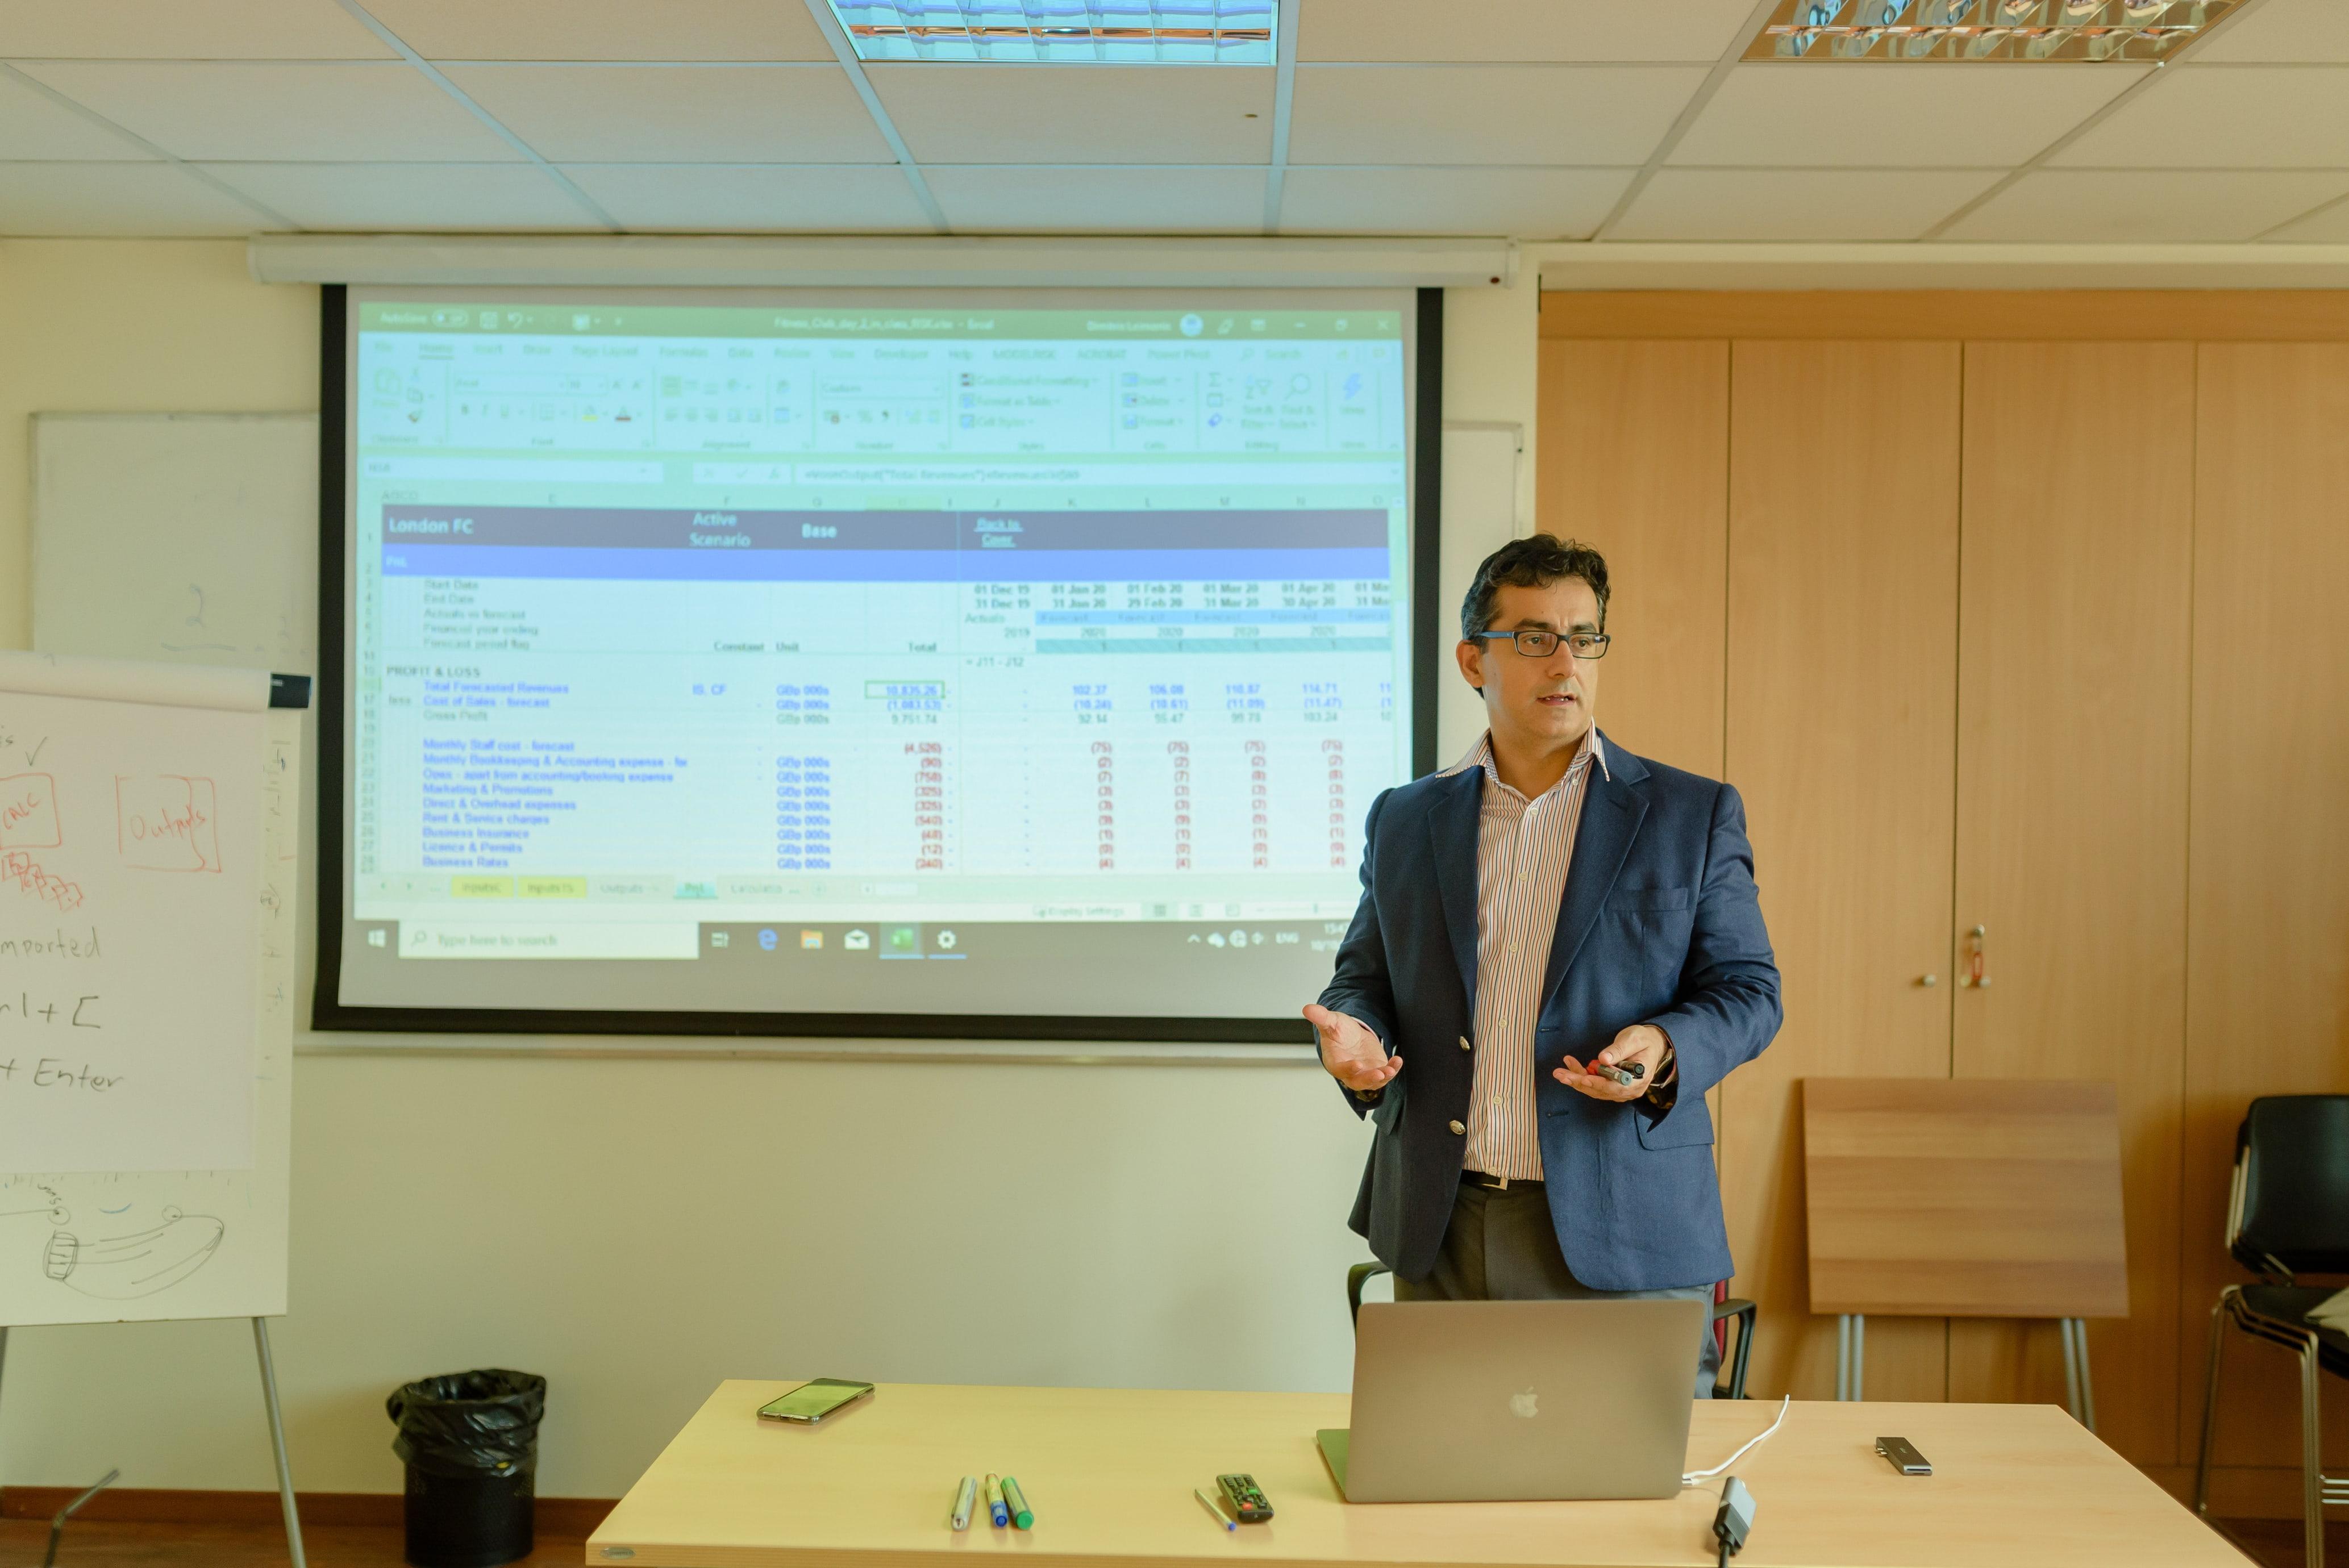 financial modeling , risk analysis, data analytics , business intelligence, power bi, power query